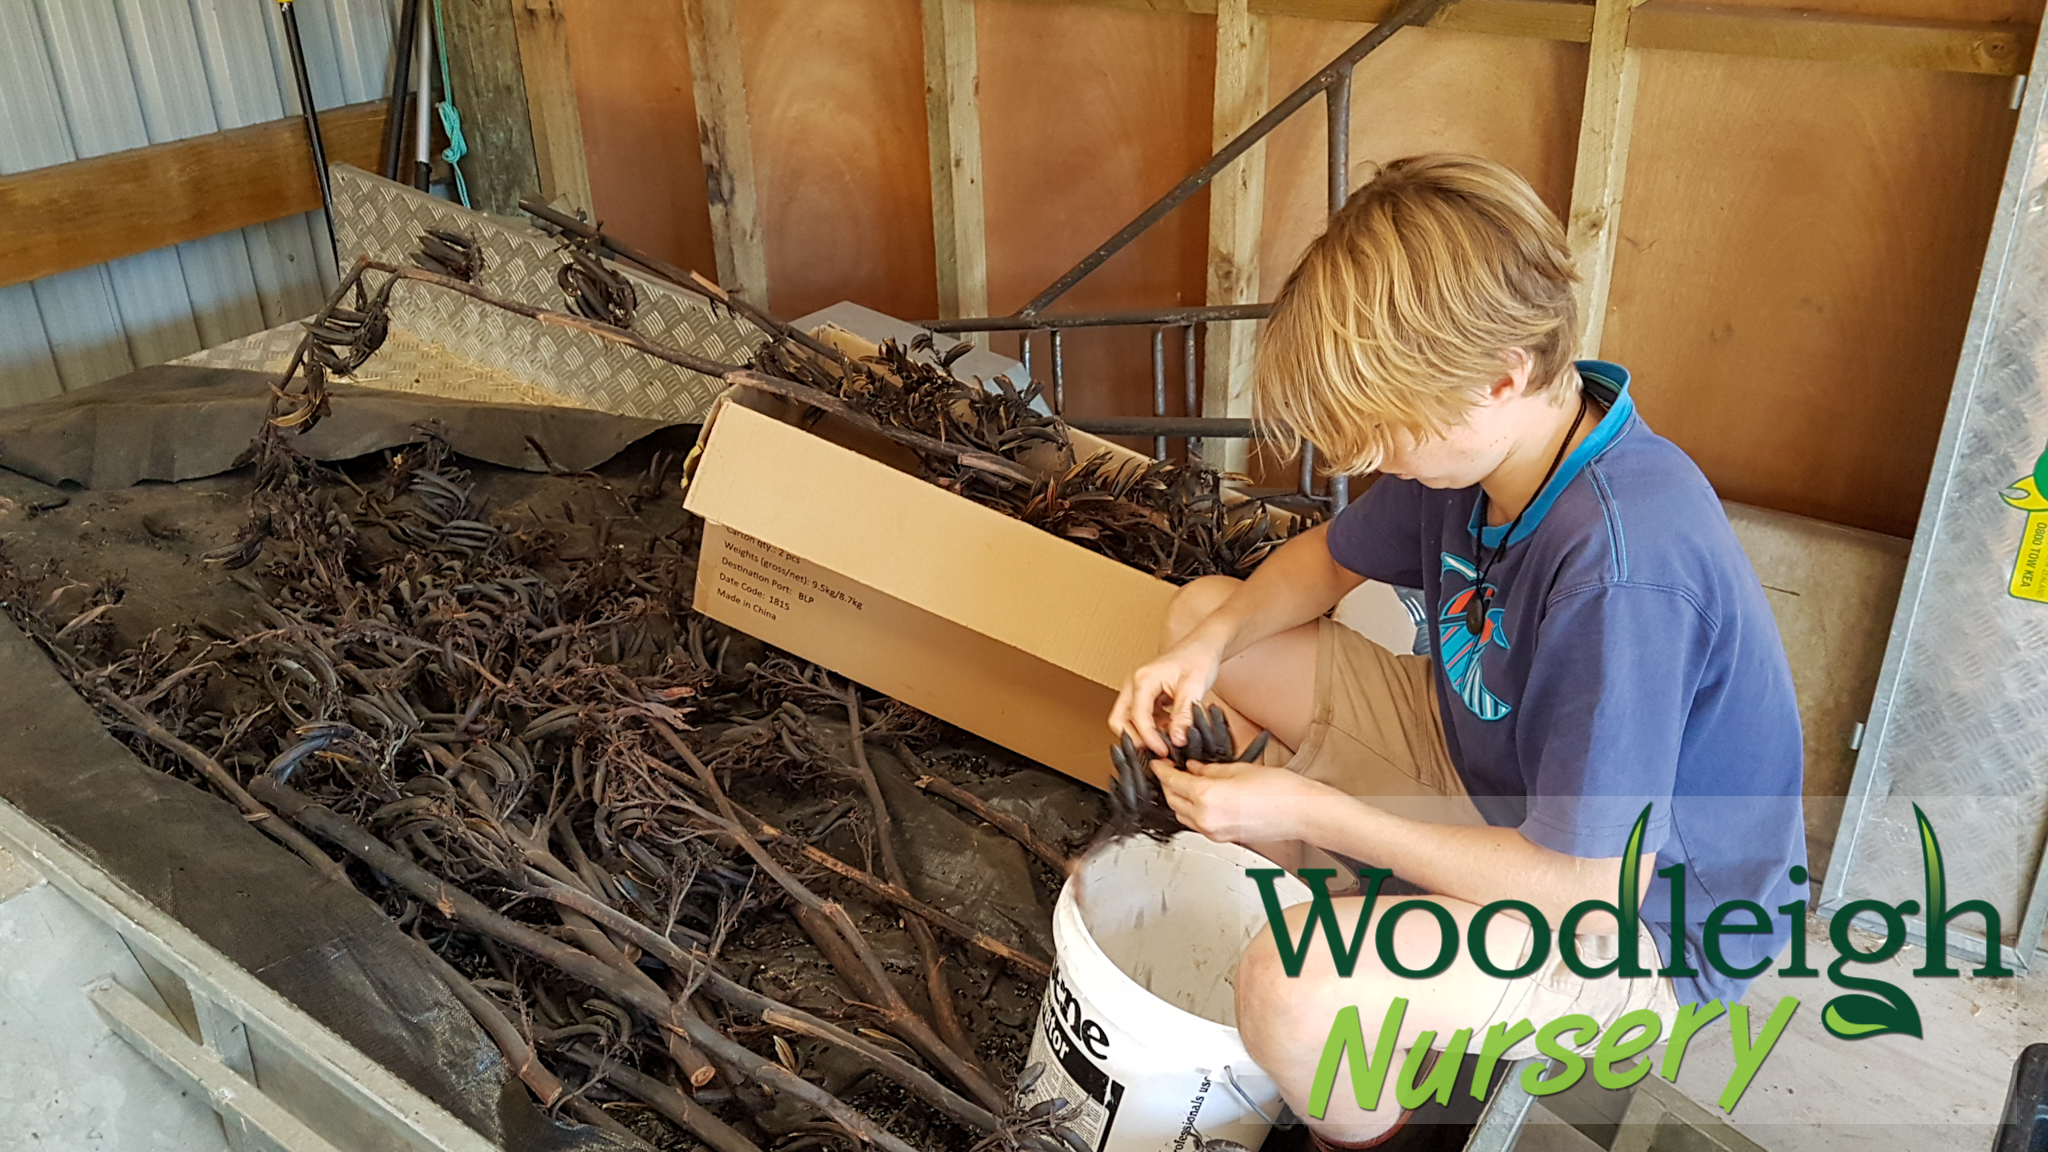 Lodi processing flax during lockdown